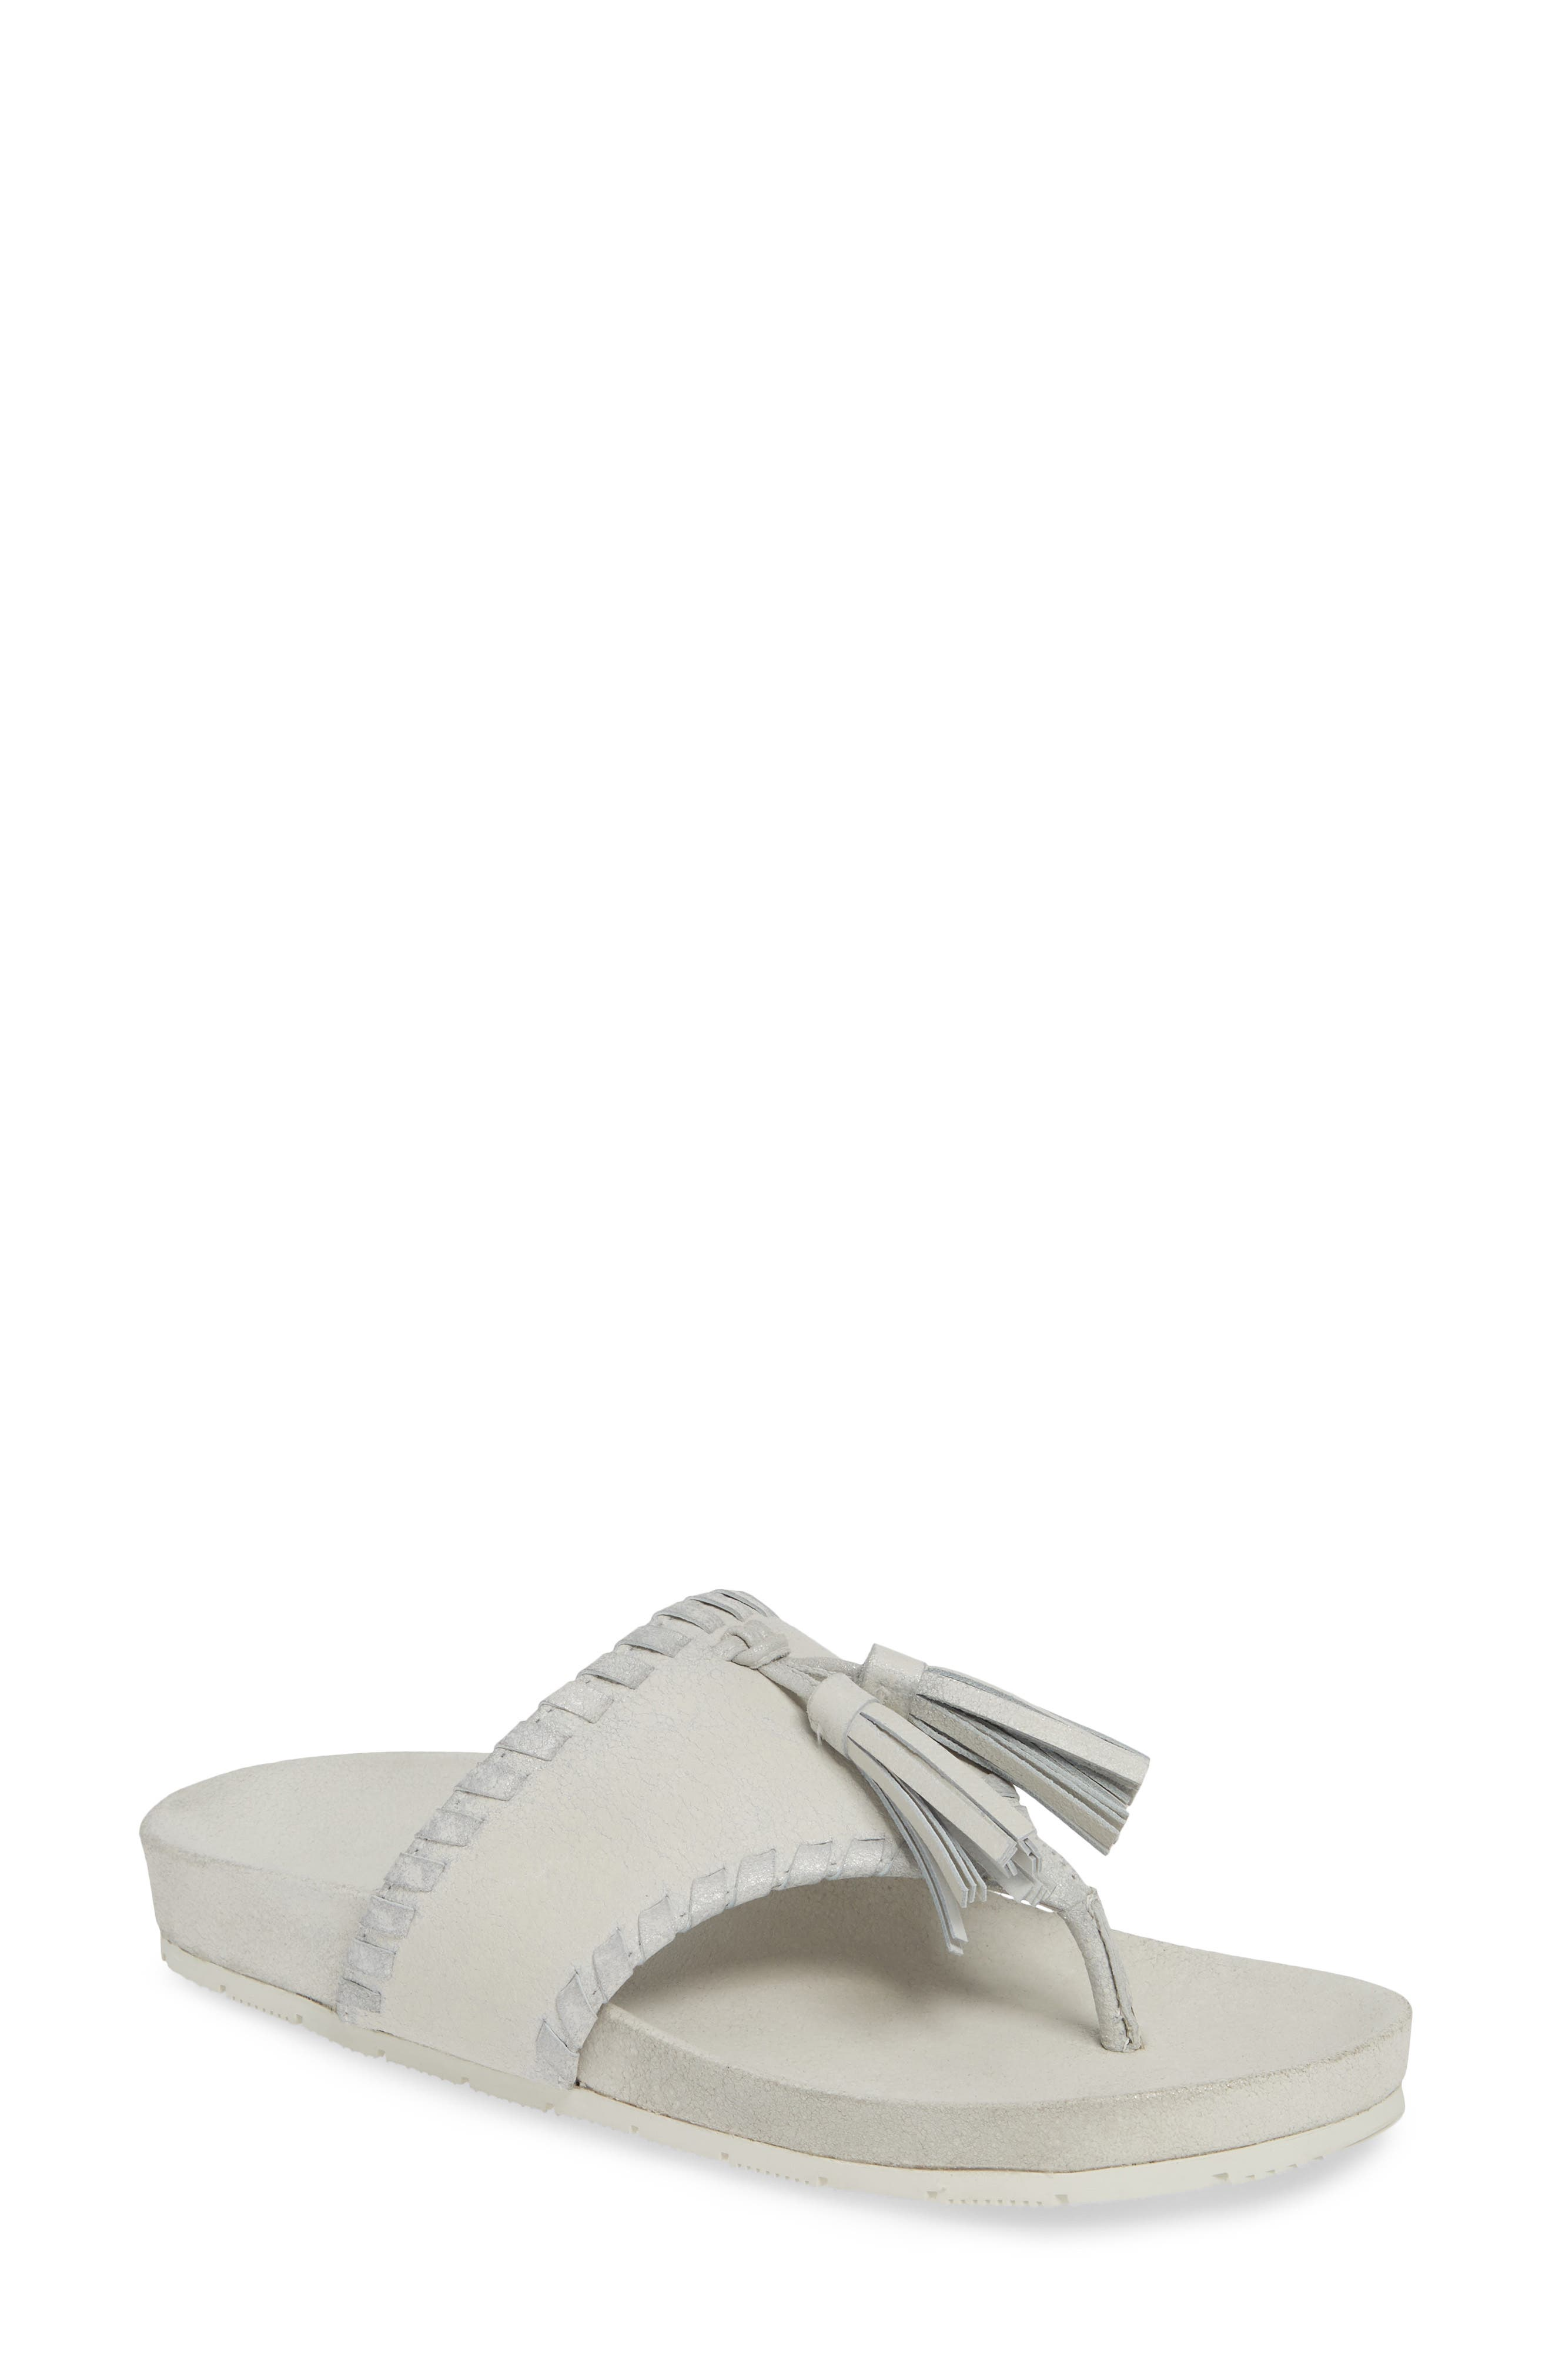 Jslides Nigel Tassel Slide Sandal, Metallic